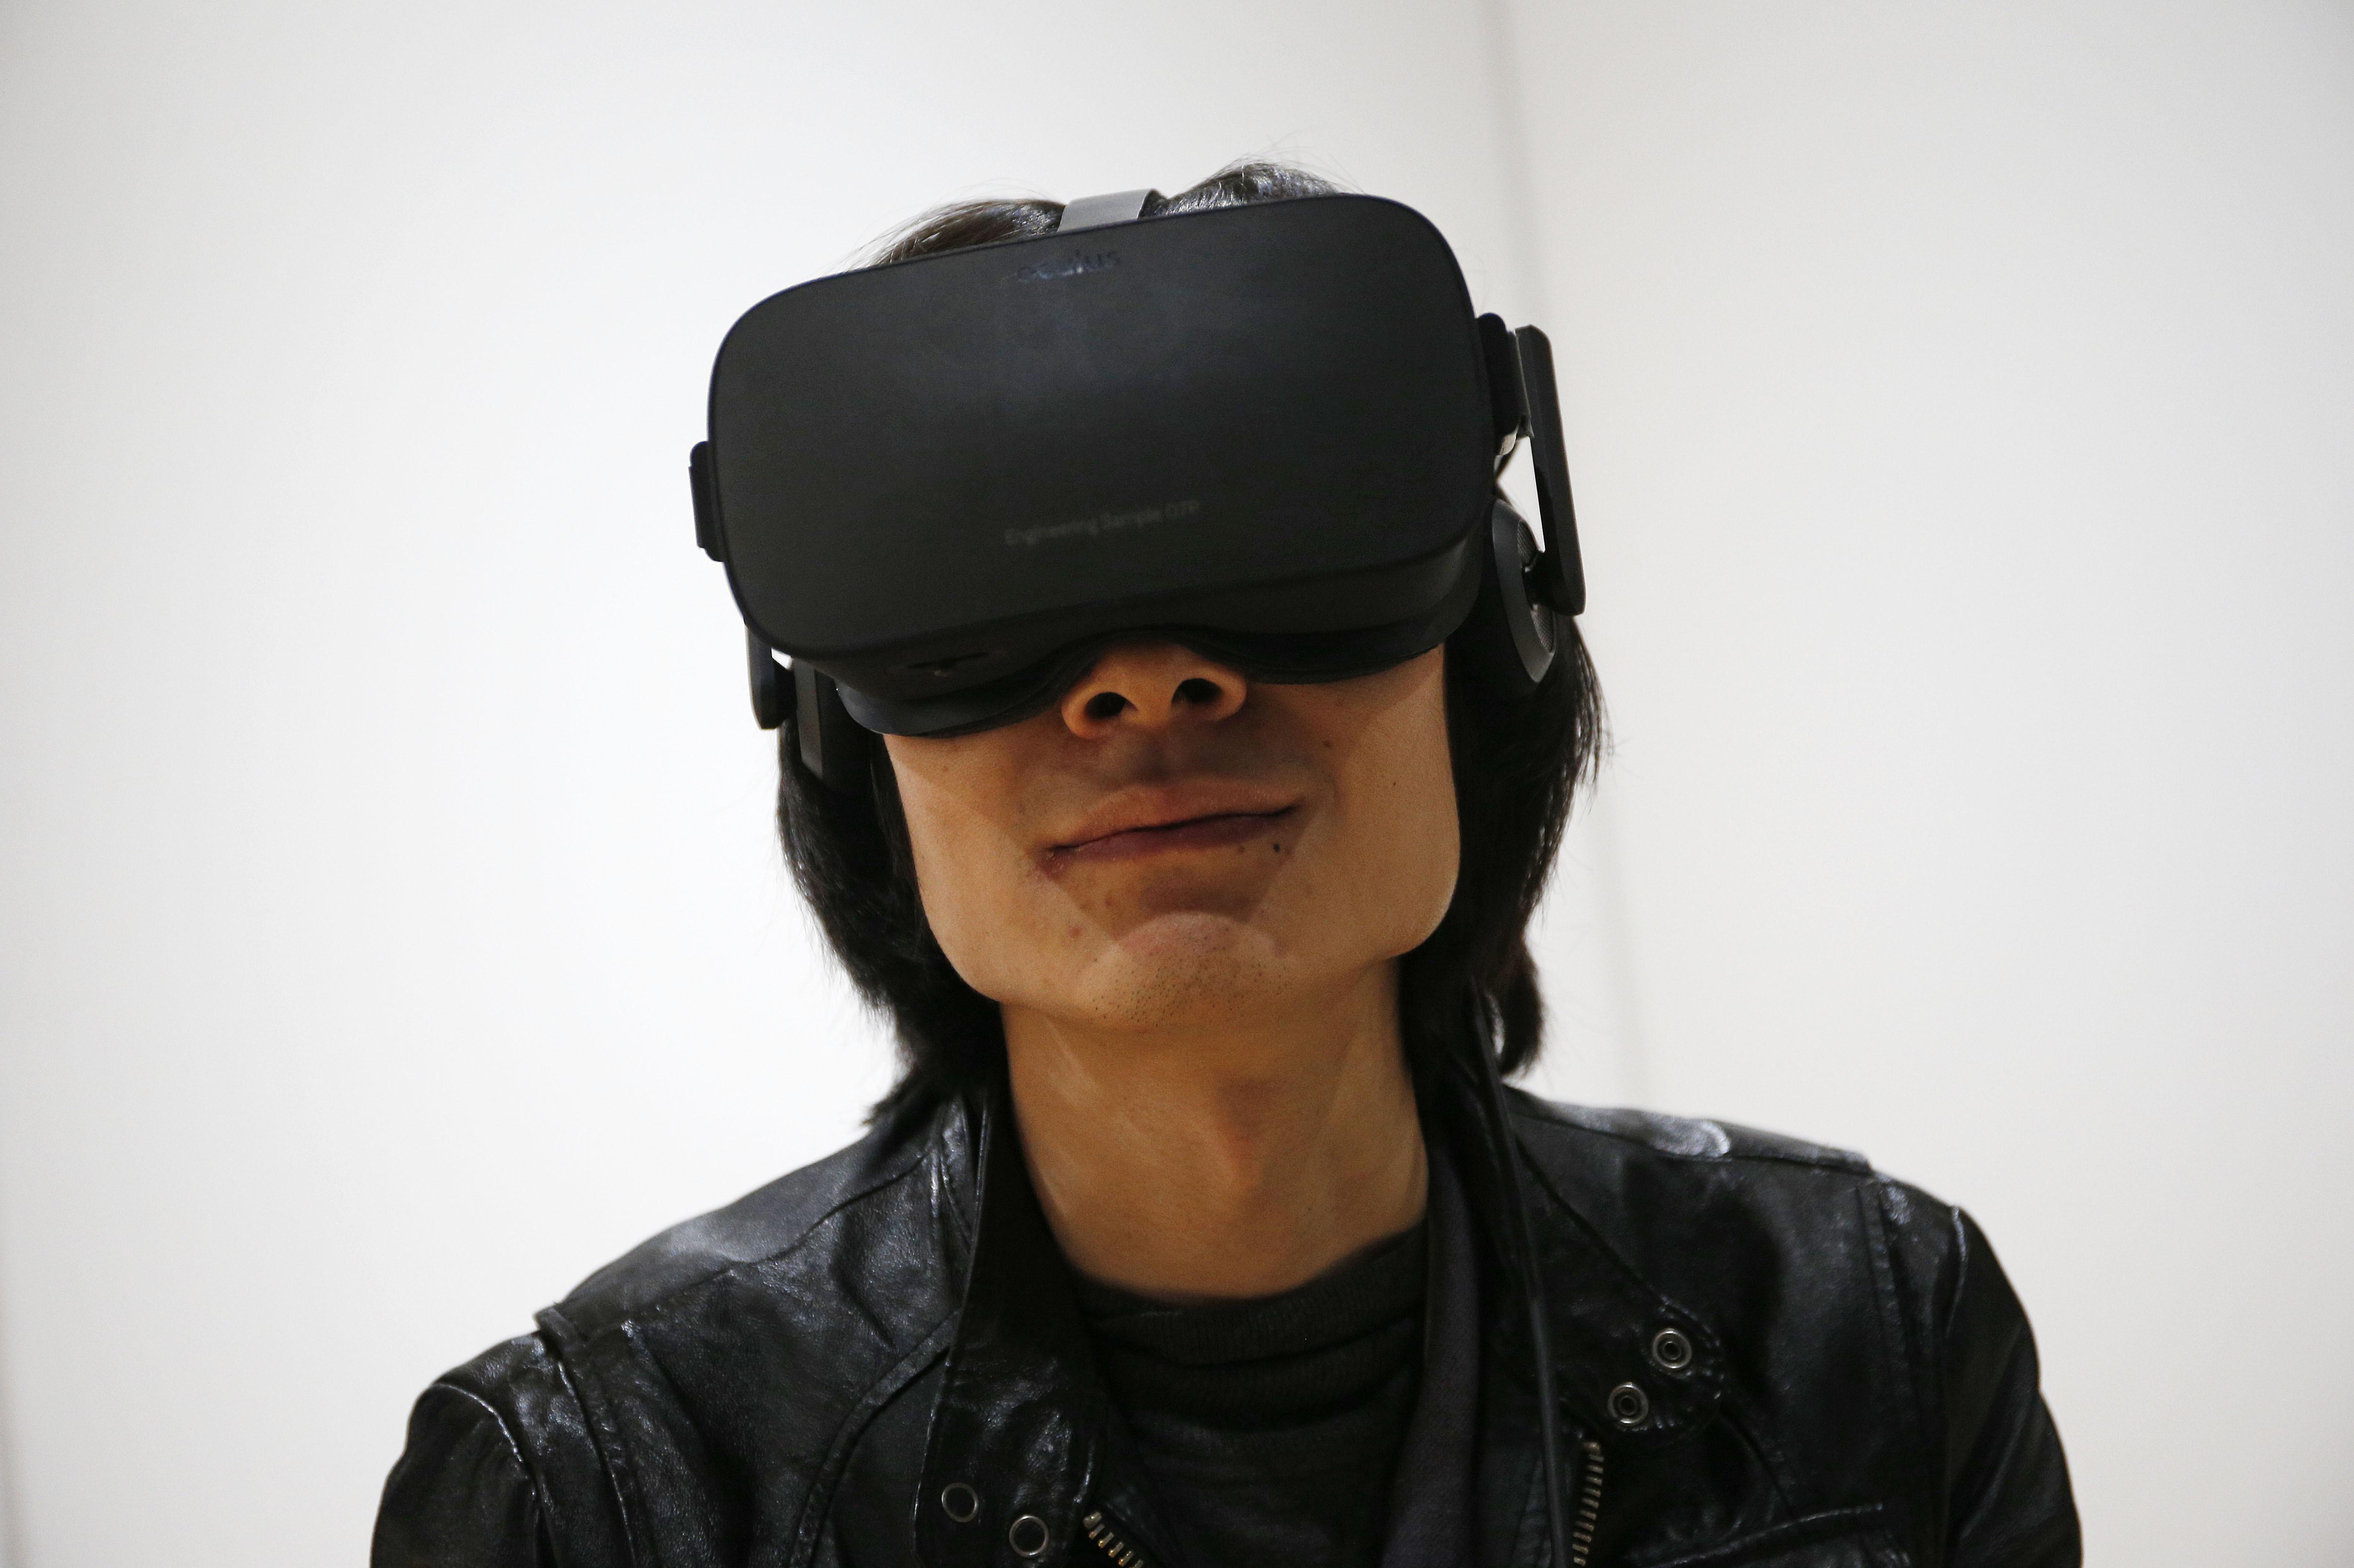 The Oculus Rift VR headset. Photo: AP/John Locher